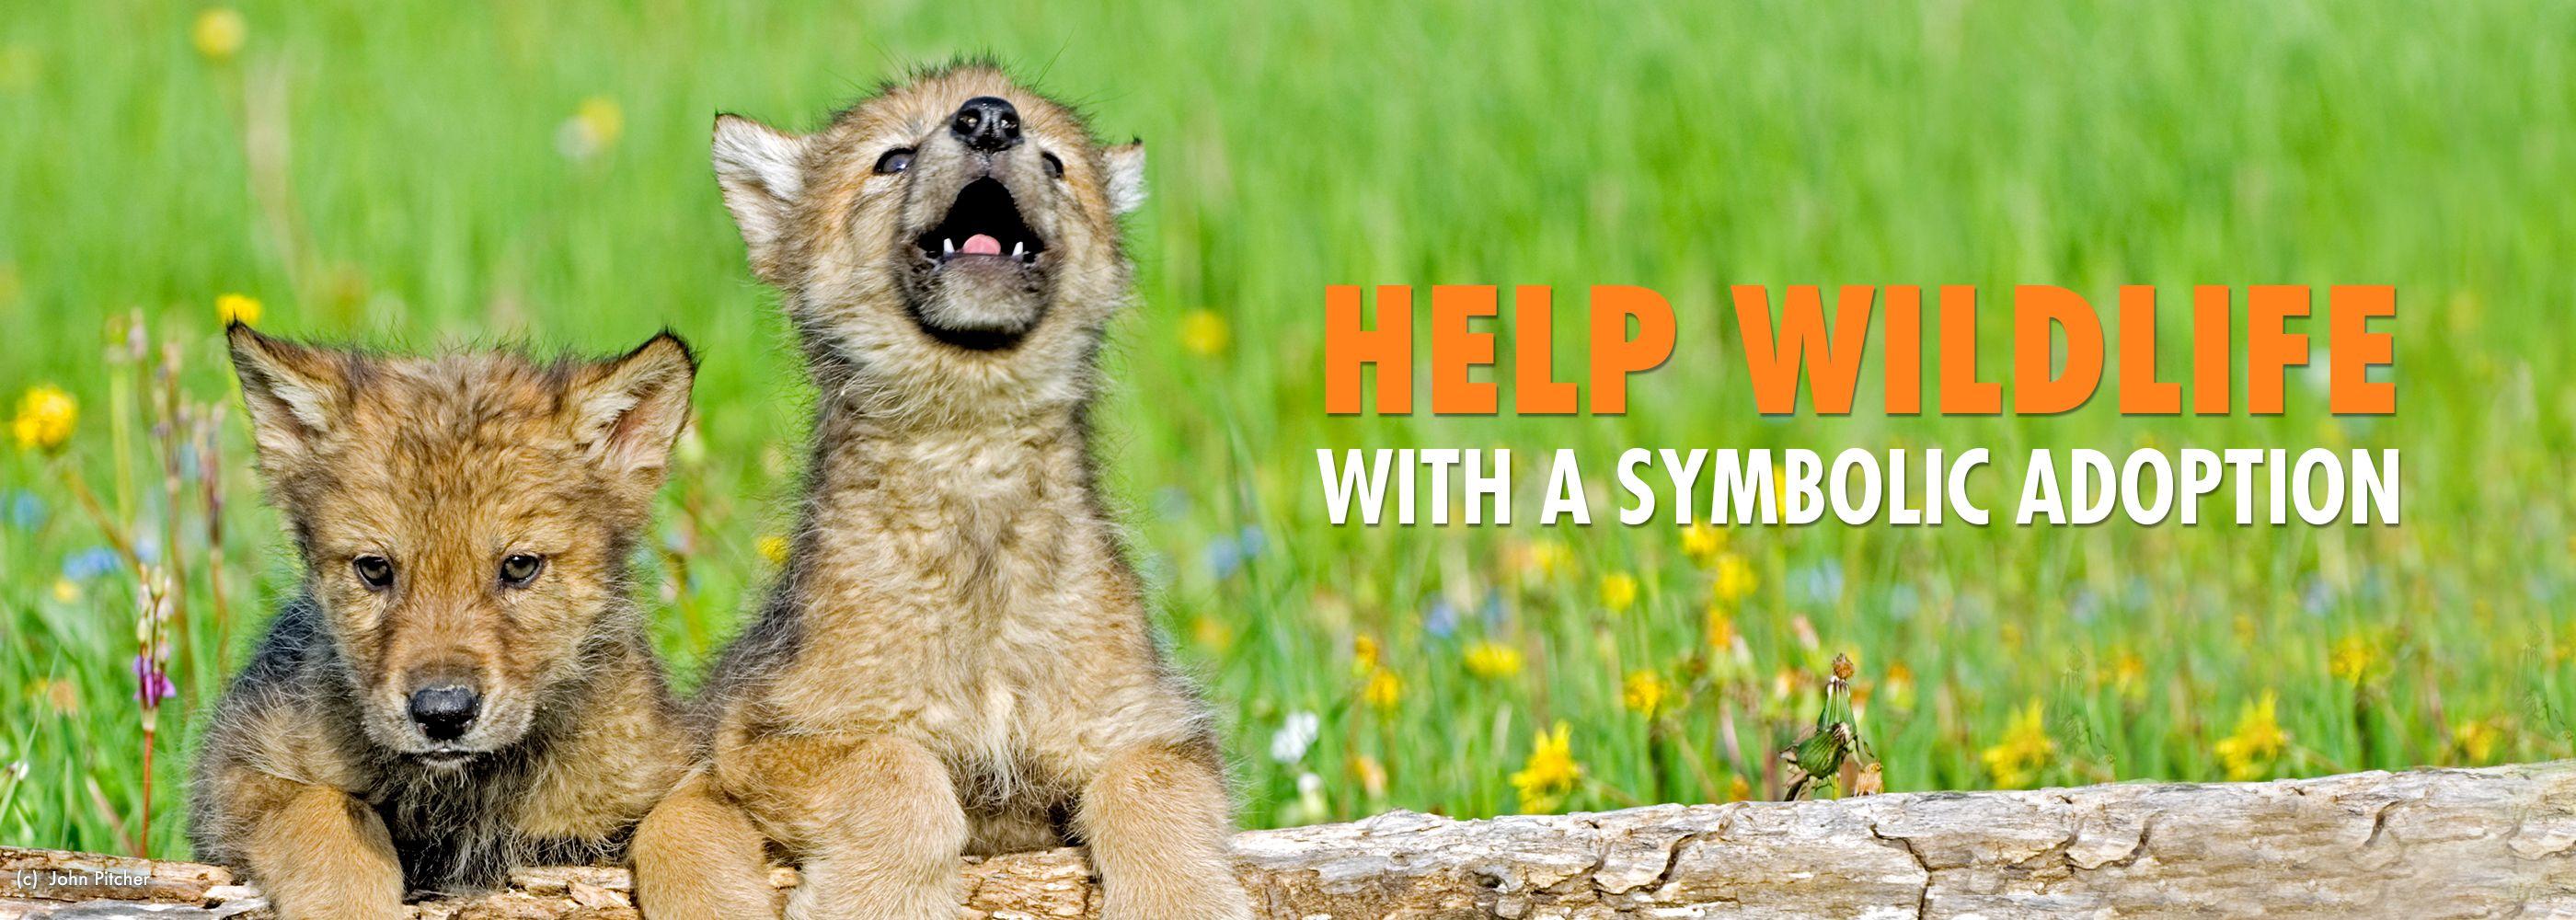 Adopt A Wild Animal And Help Protect Wildlife Wildlife Adoption And Gift Center Animals Wild Animals Animal Abuse